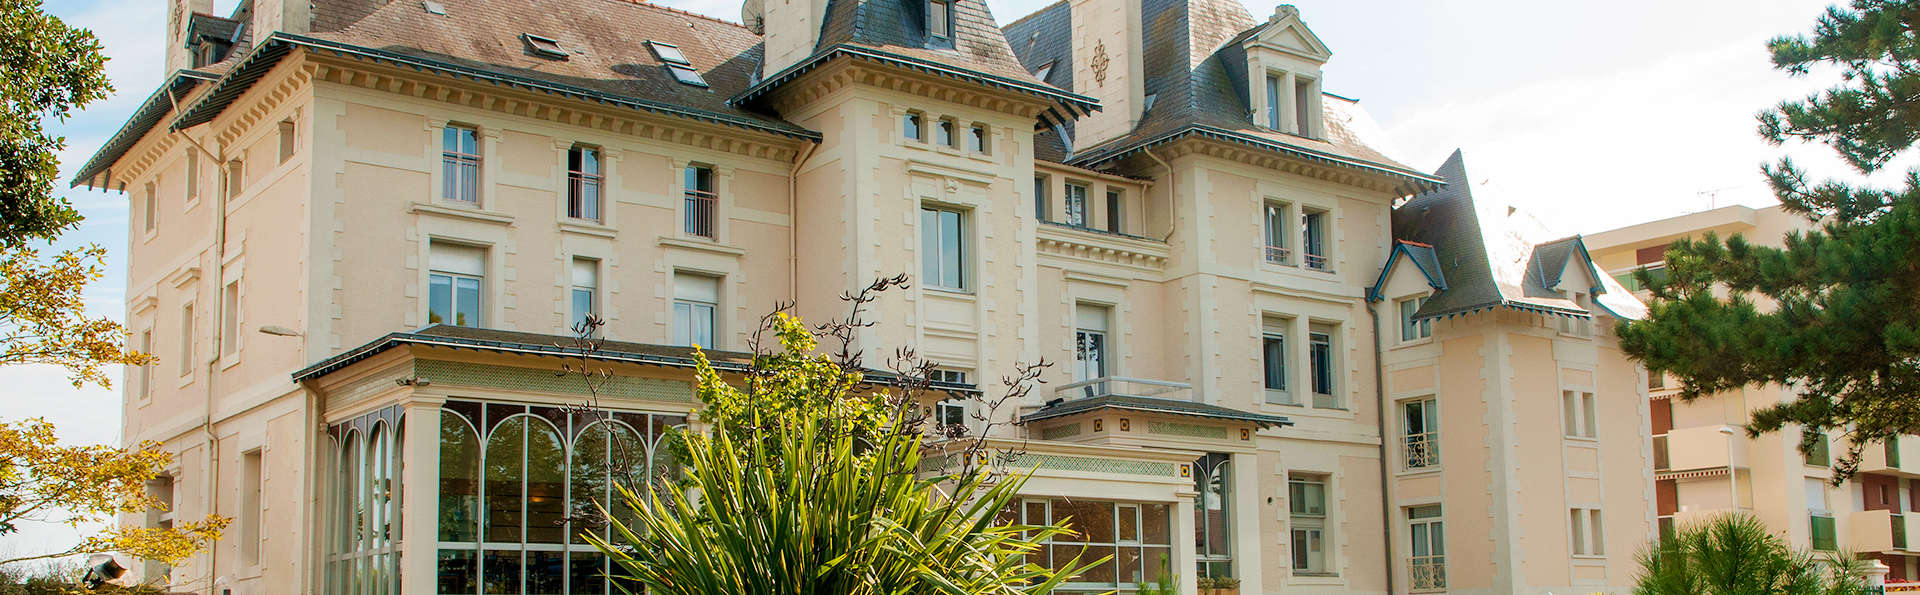 Hôtel Vacances Bleues Villa Caroline - EDIT_Fachada_4.jpg